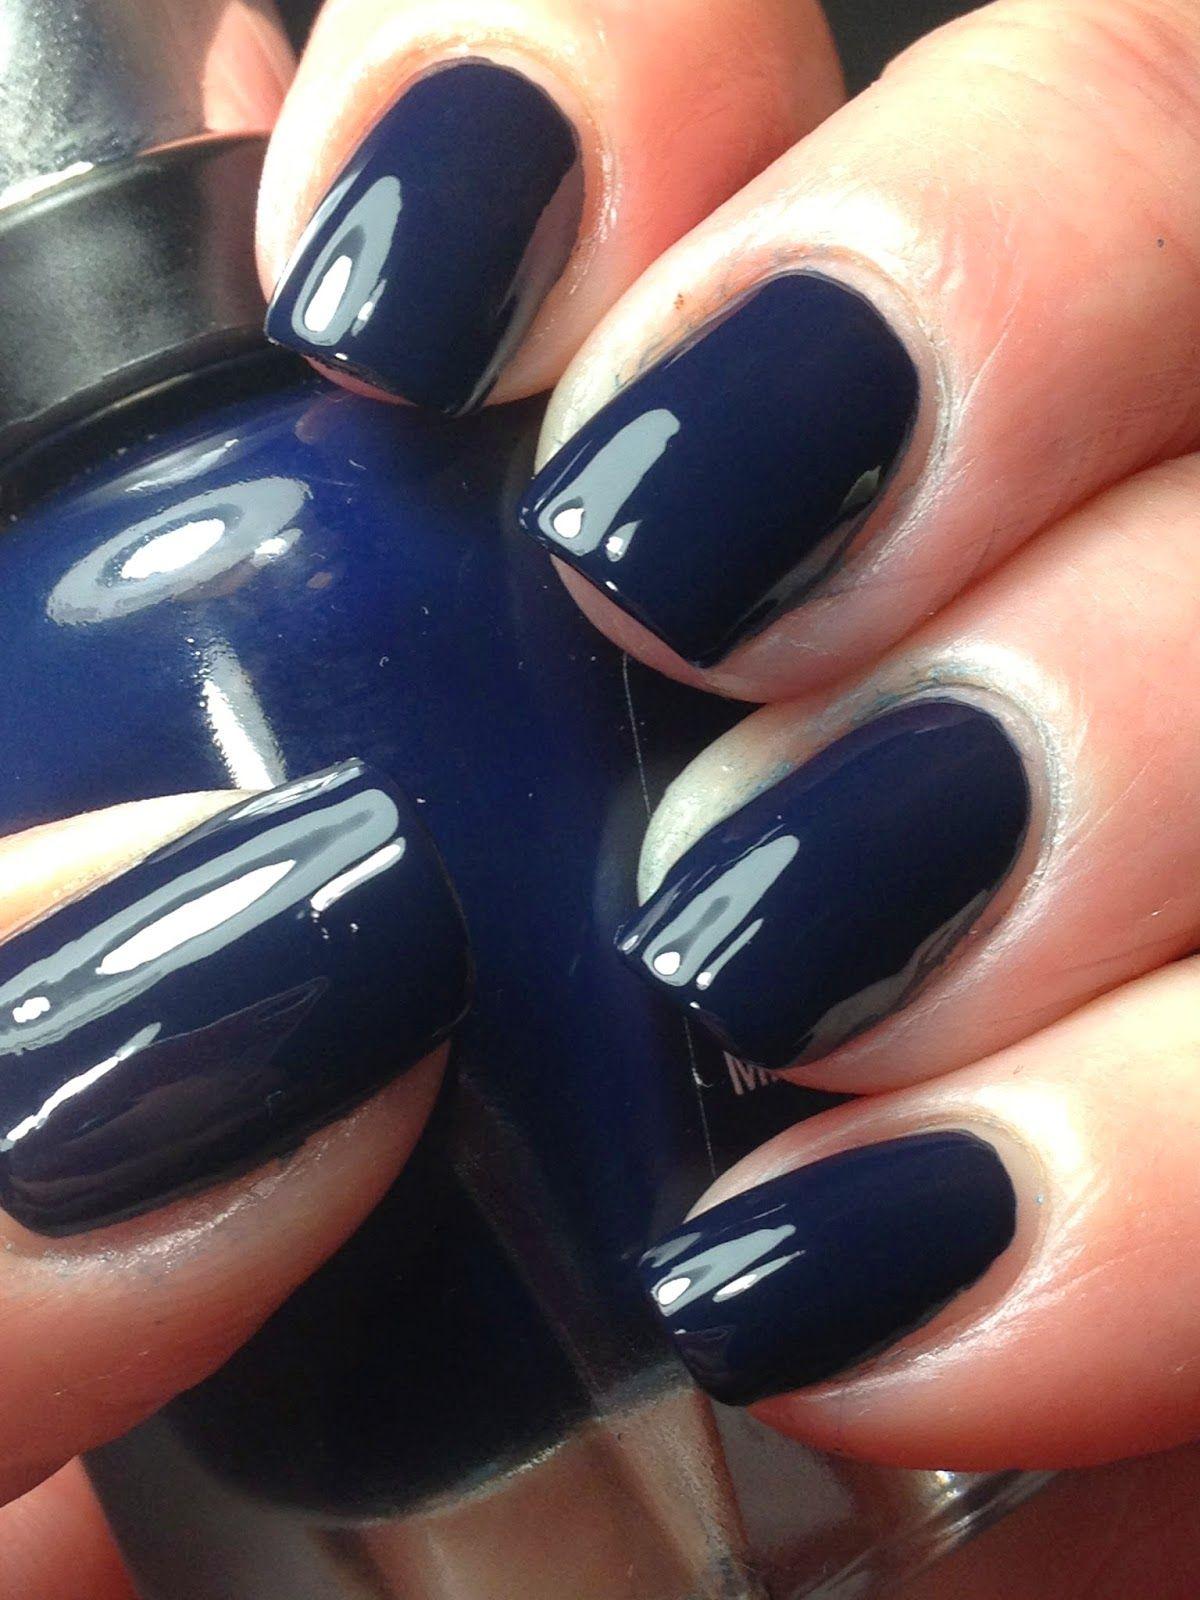 Sally Hansen Complete Salon Manicure Quot Dark Huemoor Quot My Nail Polish Addiction Dark Nails